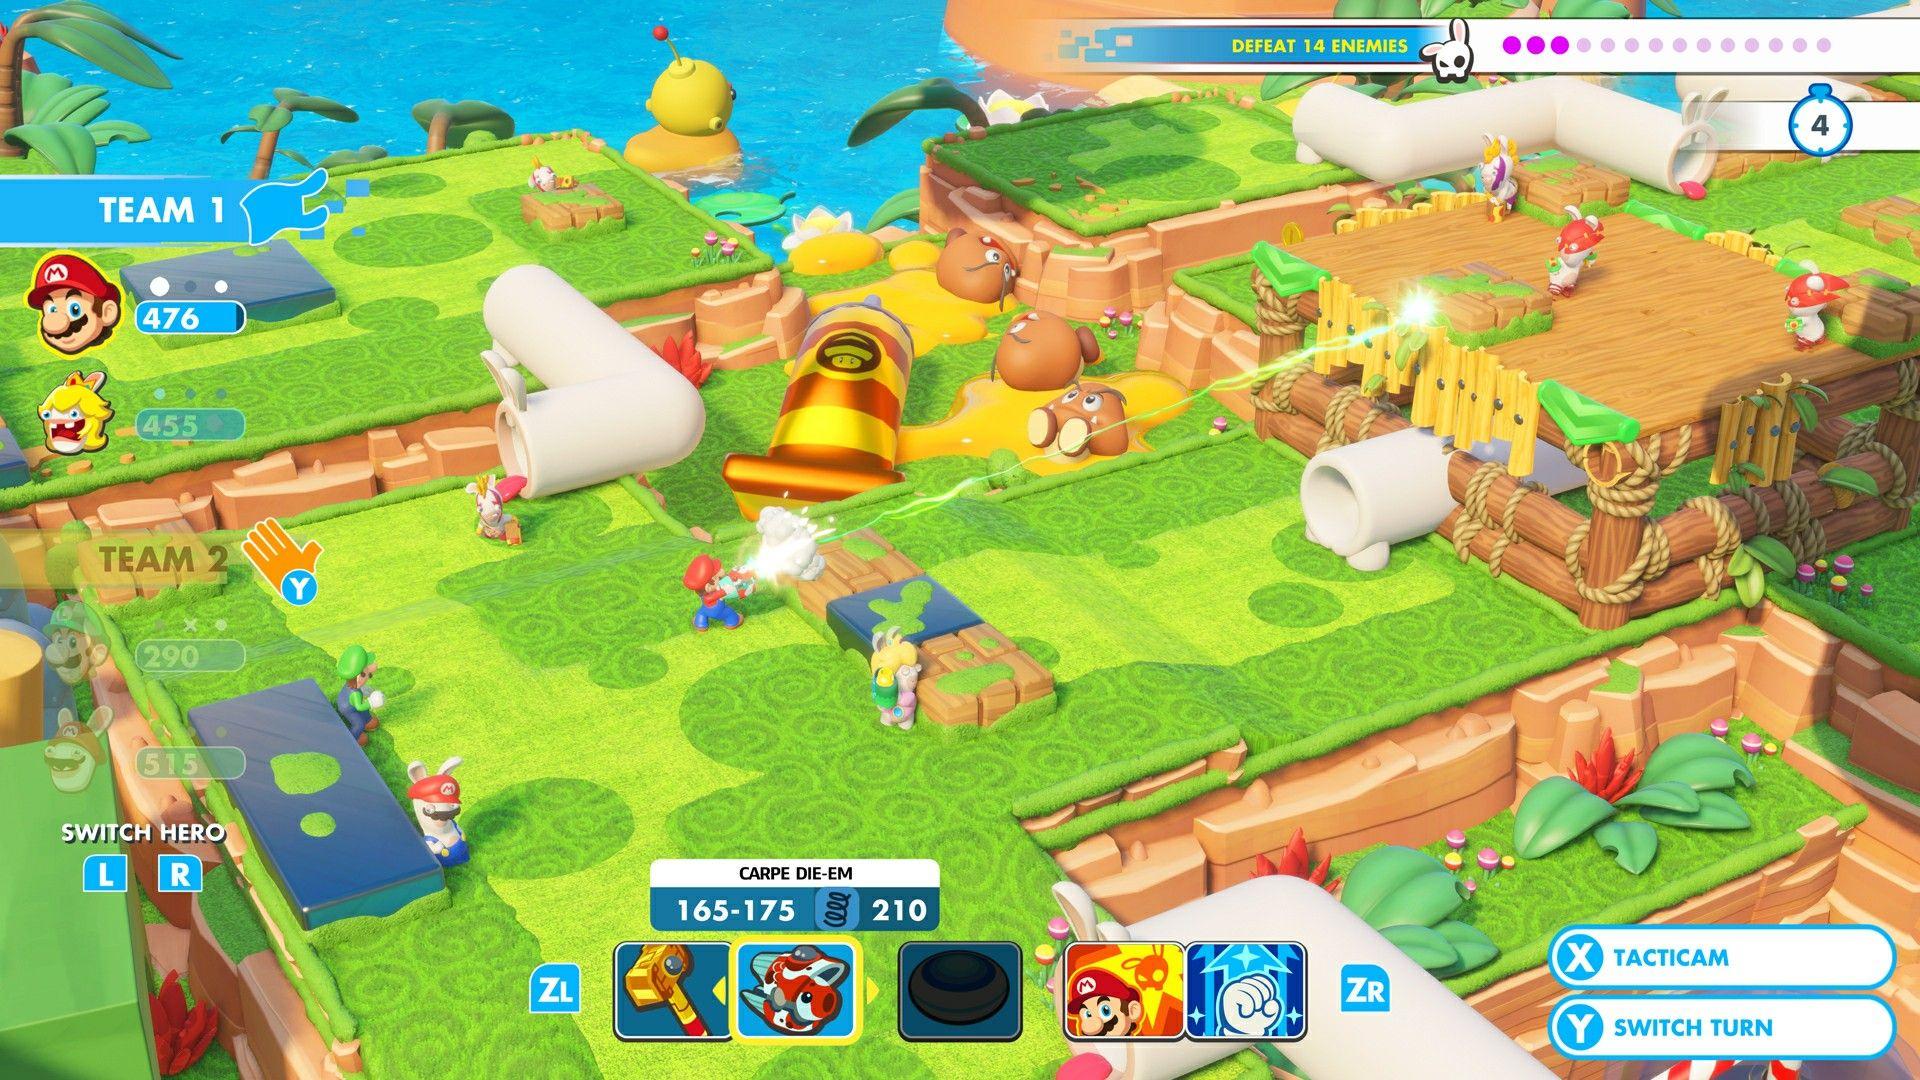 Mario X Rabbids Fun adventure games, Mario, Battle